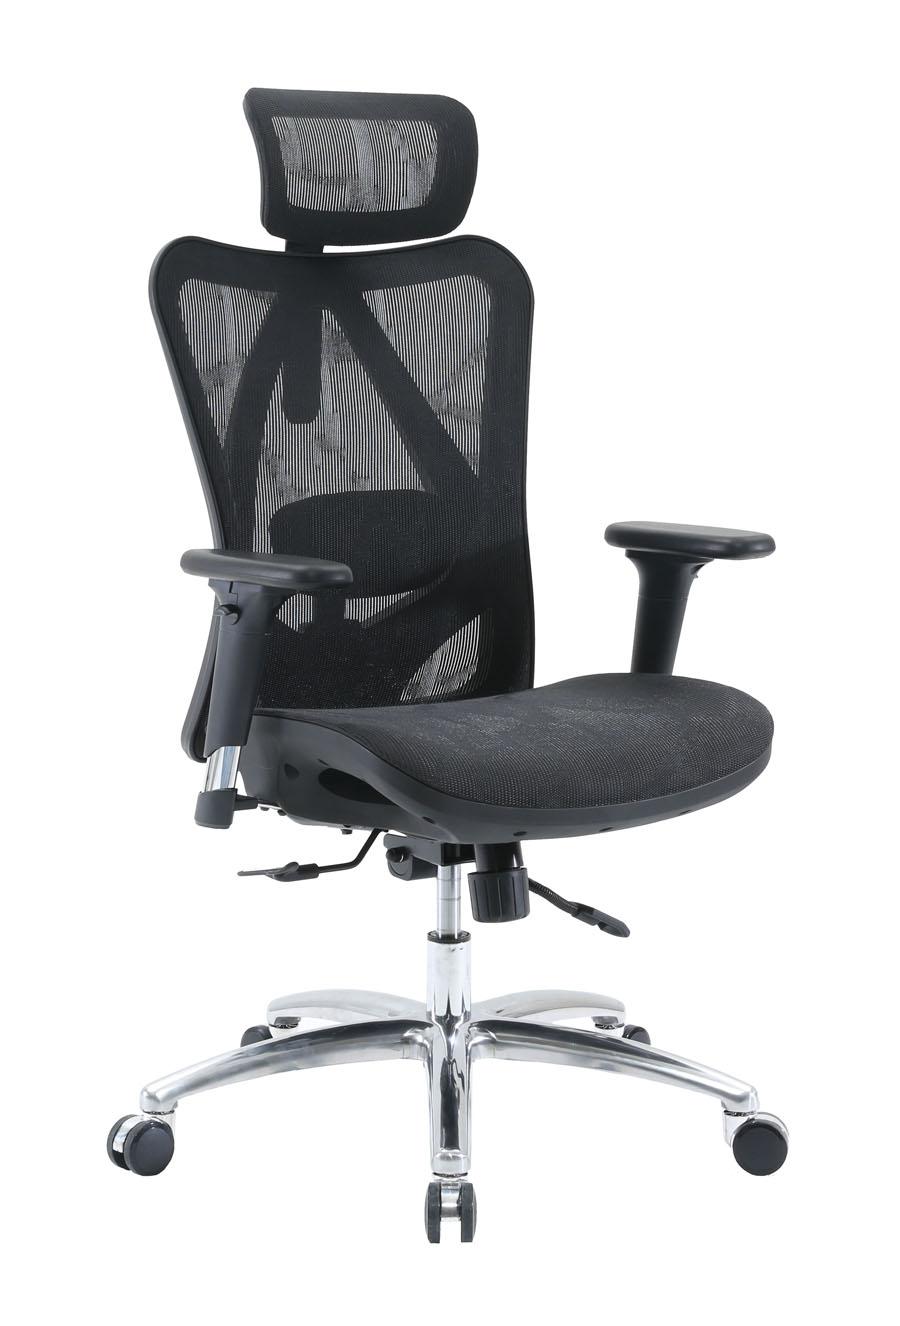 KB-1_人體工學椅_電腦椅_黑框黑網_正斜面照片